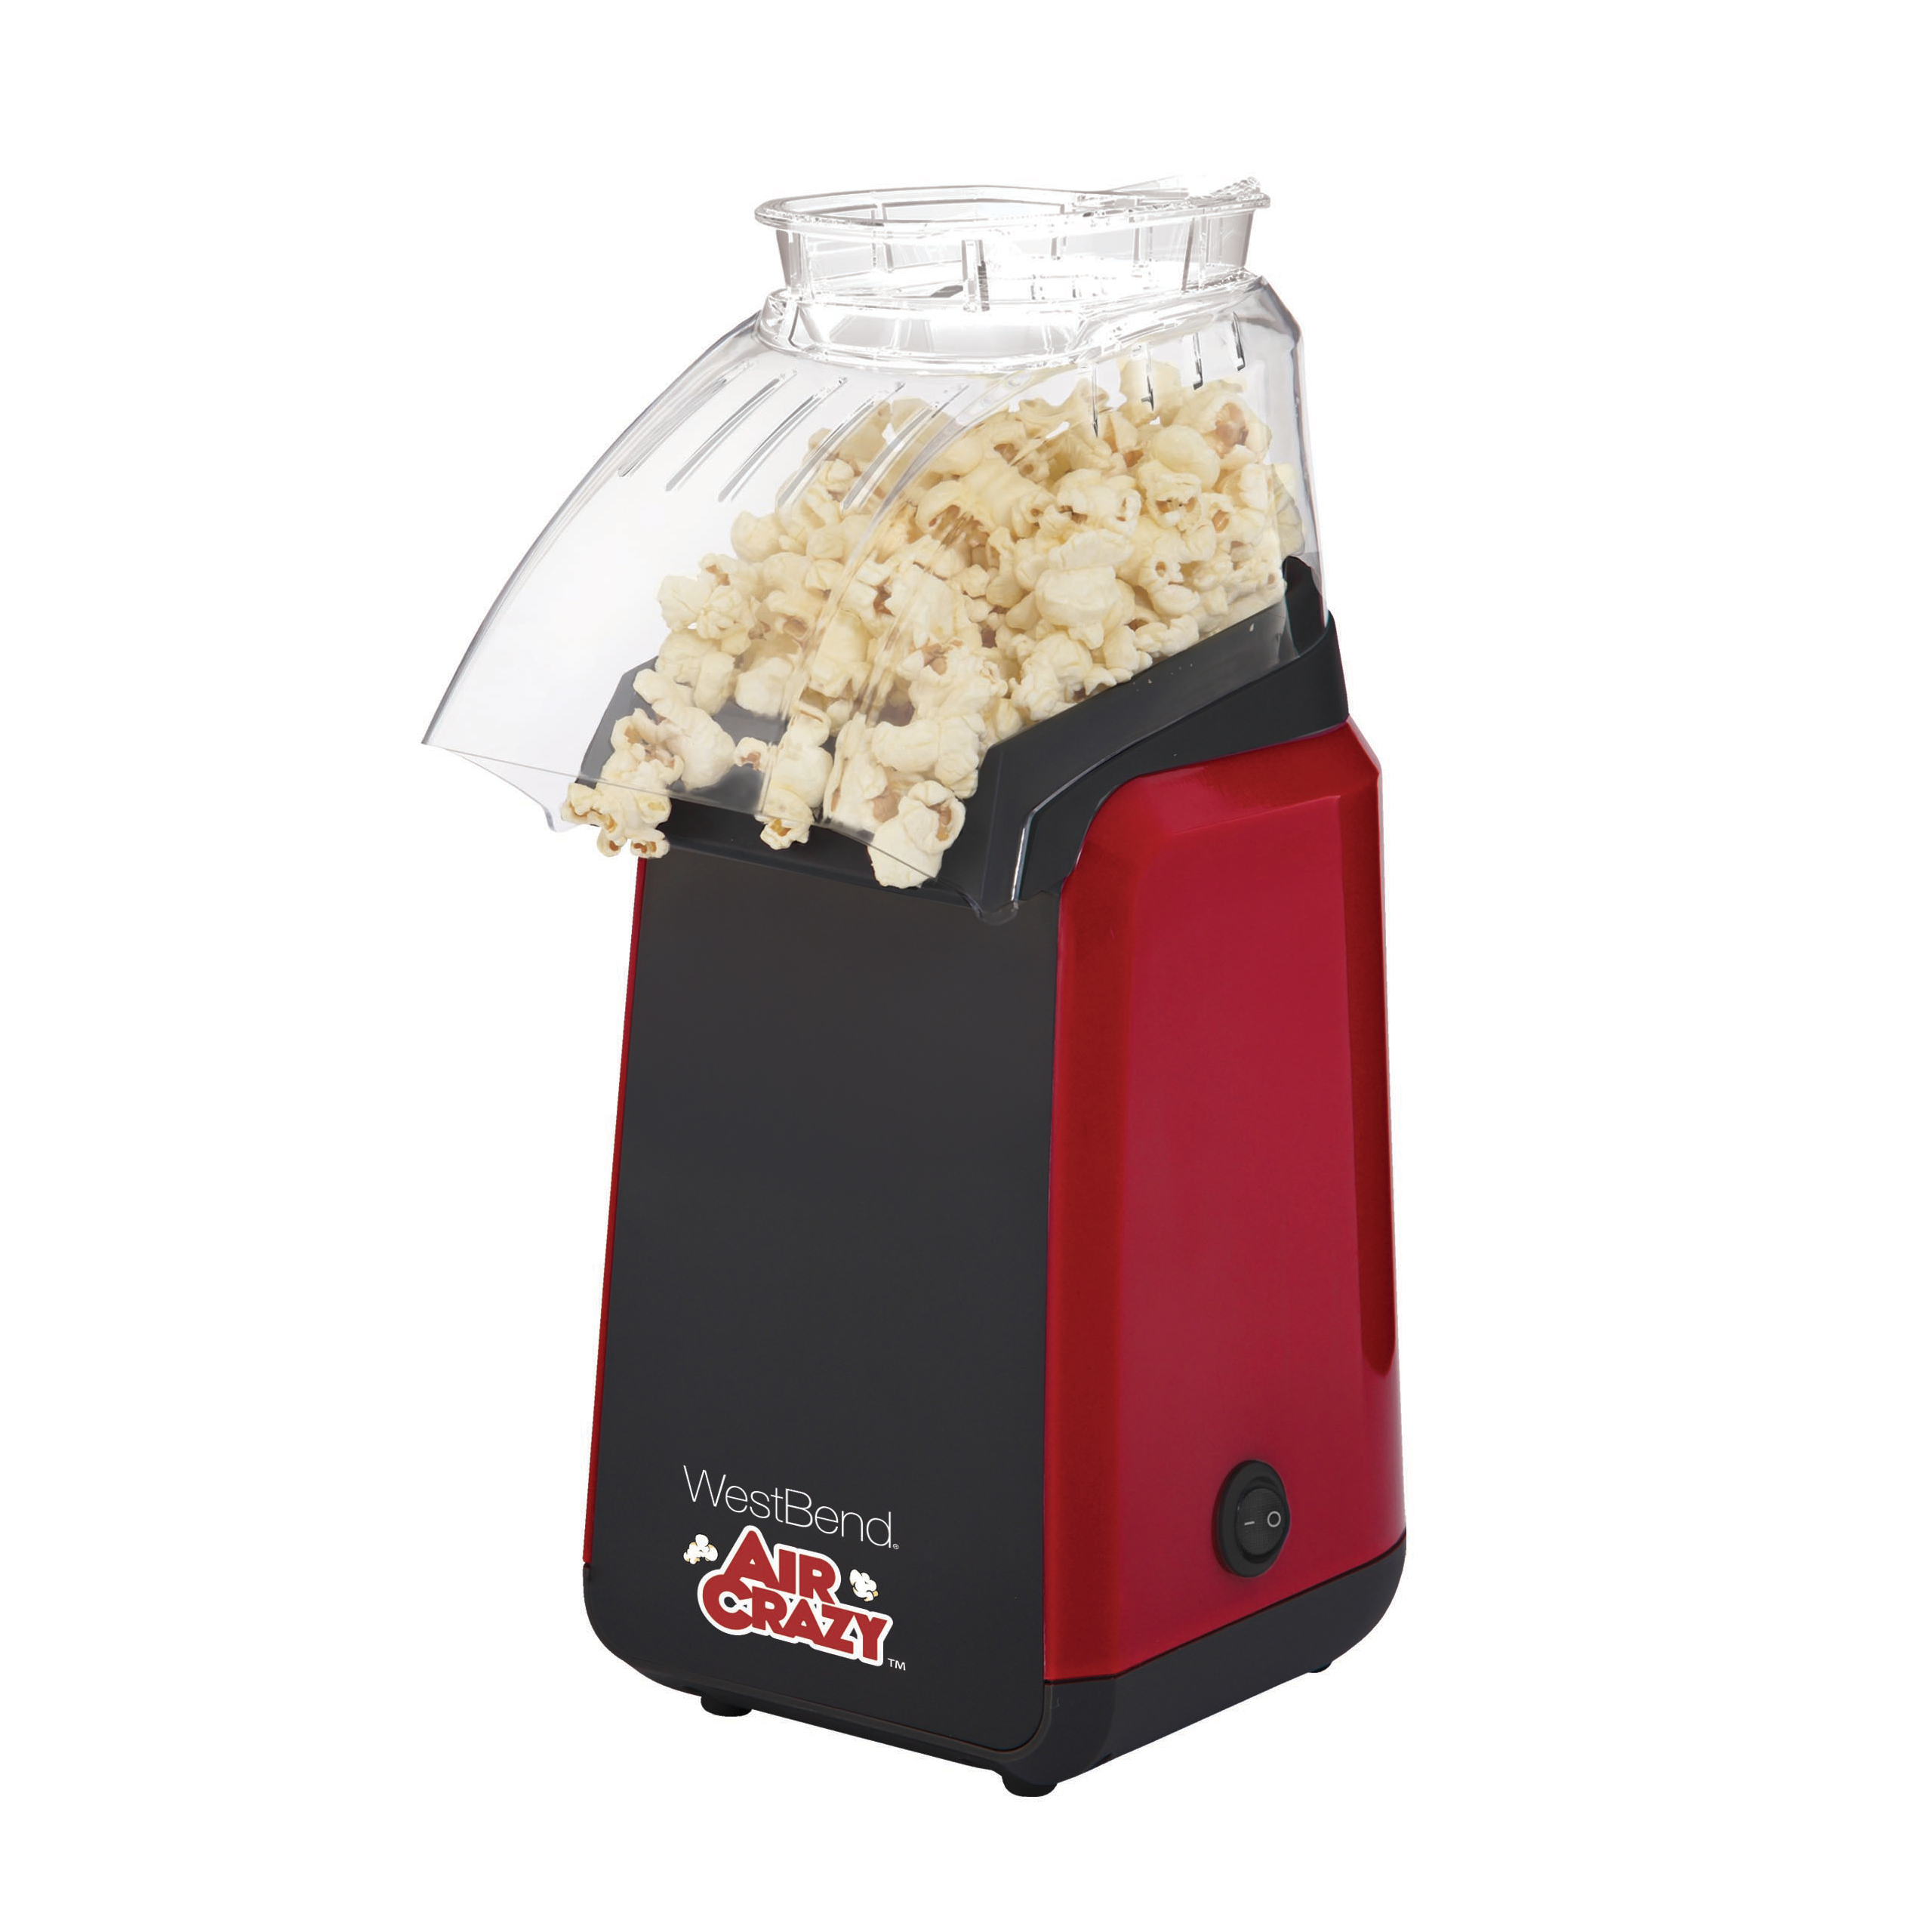 West Bend 82418r Air Crazy 4 Quart Hot Air Popcorn Popper Red